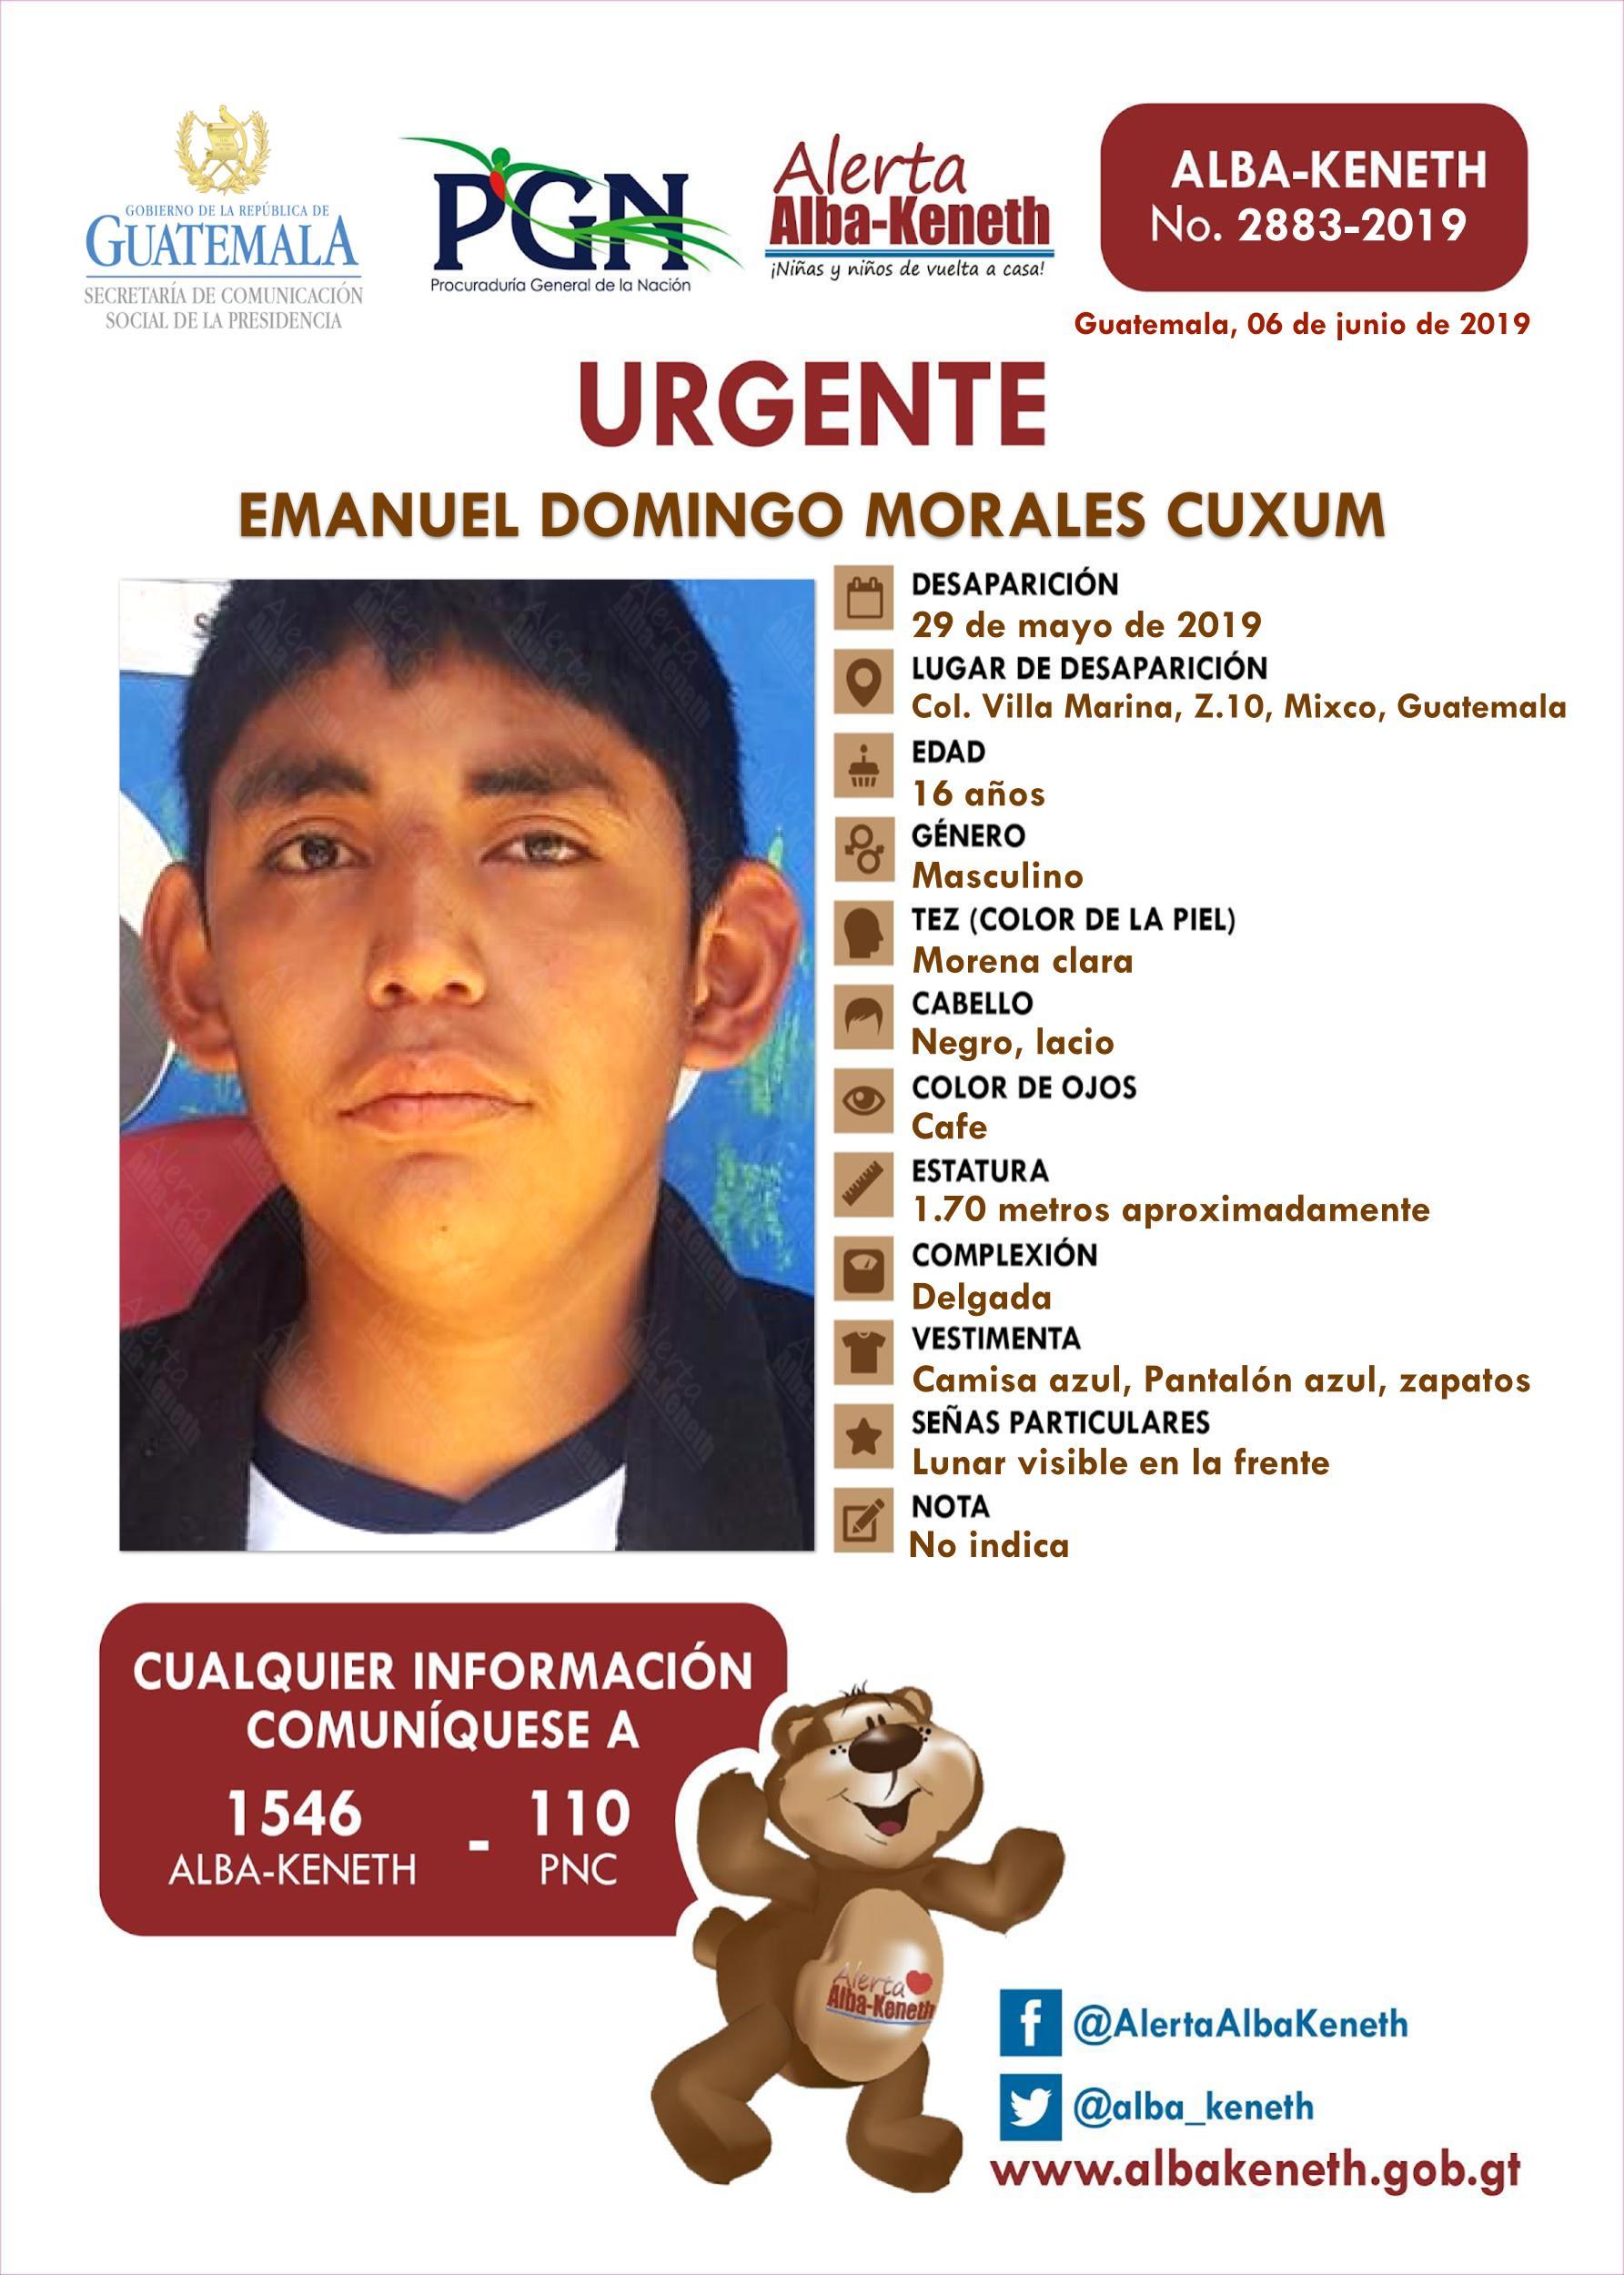 Emanuel Domingo Morales Cuxum